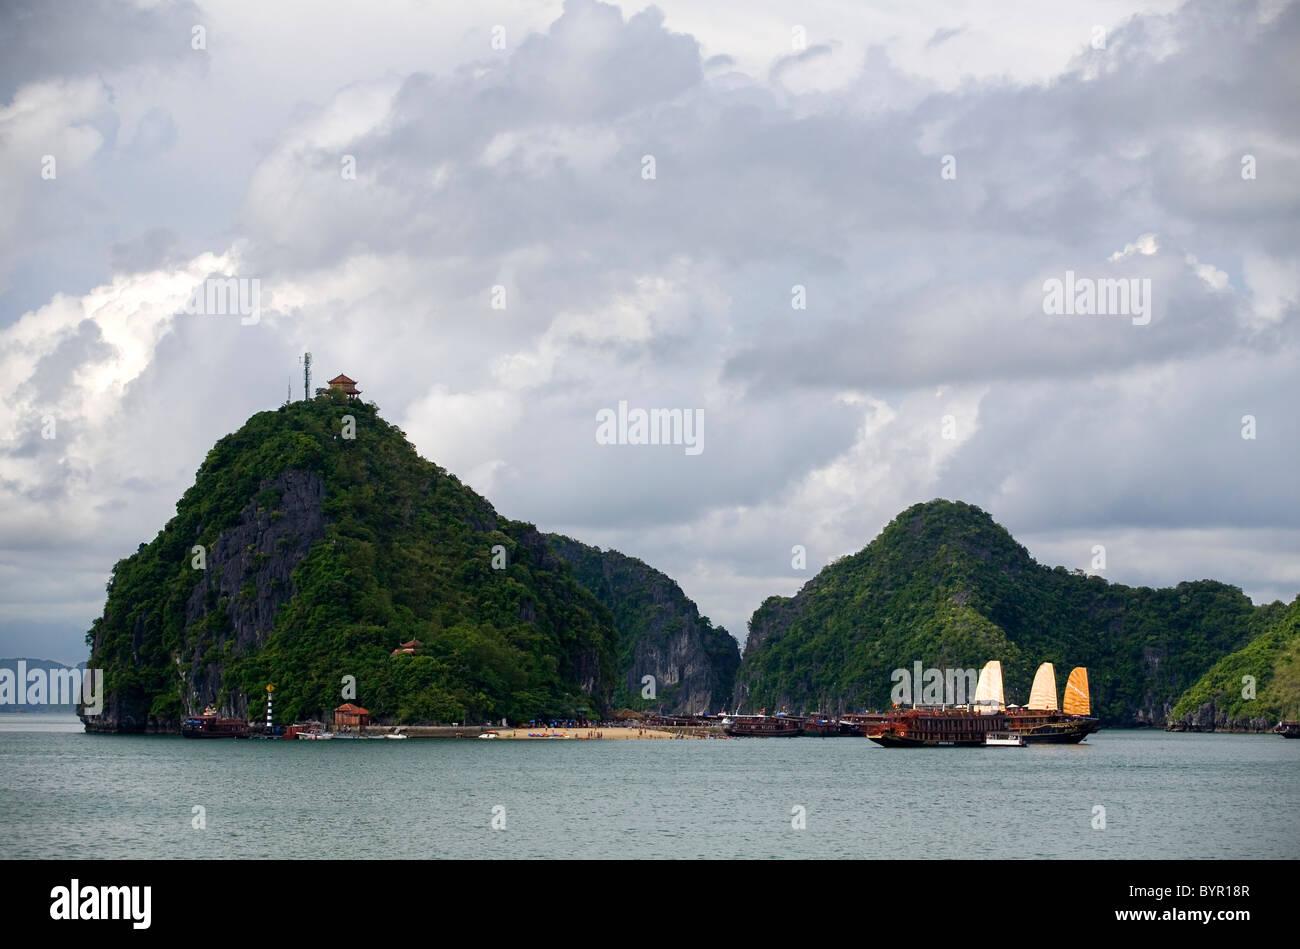 Junk boat in Ha Long Bay. Quang Ninh province, Vietnam, Asia. - Stock Image